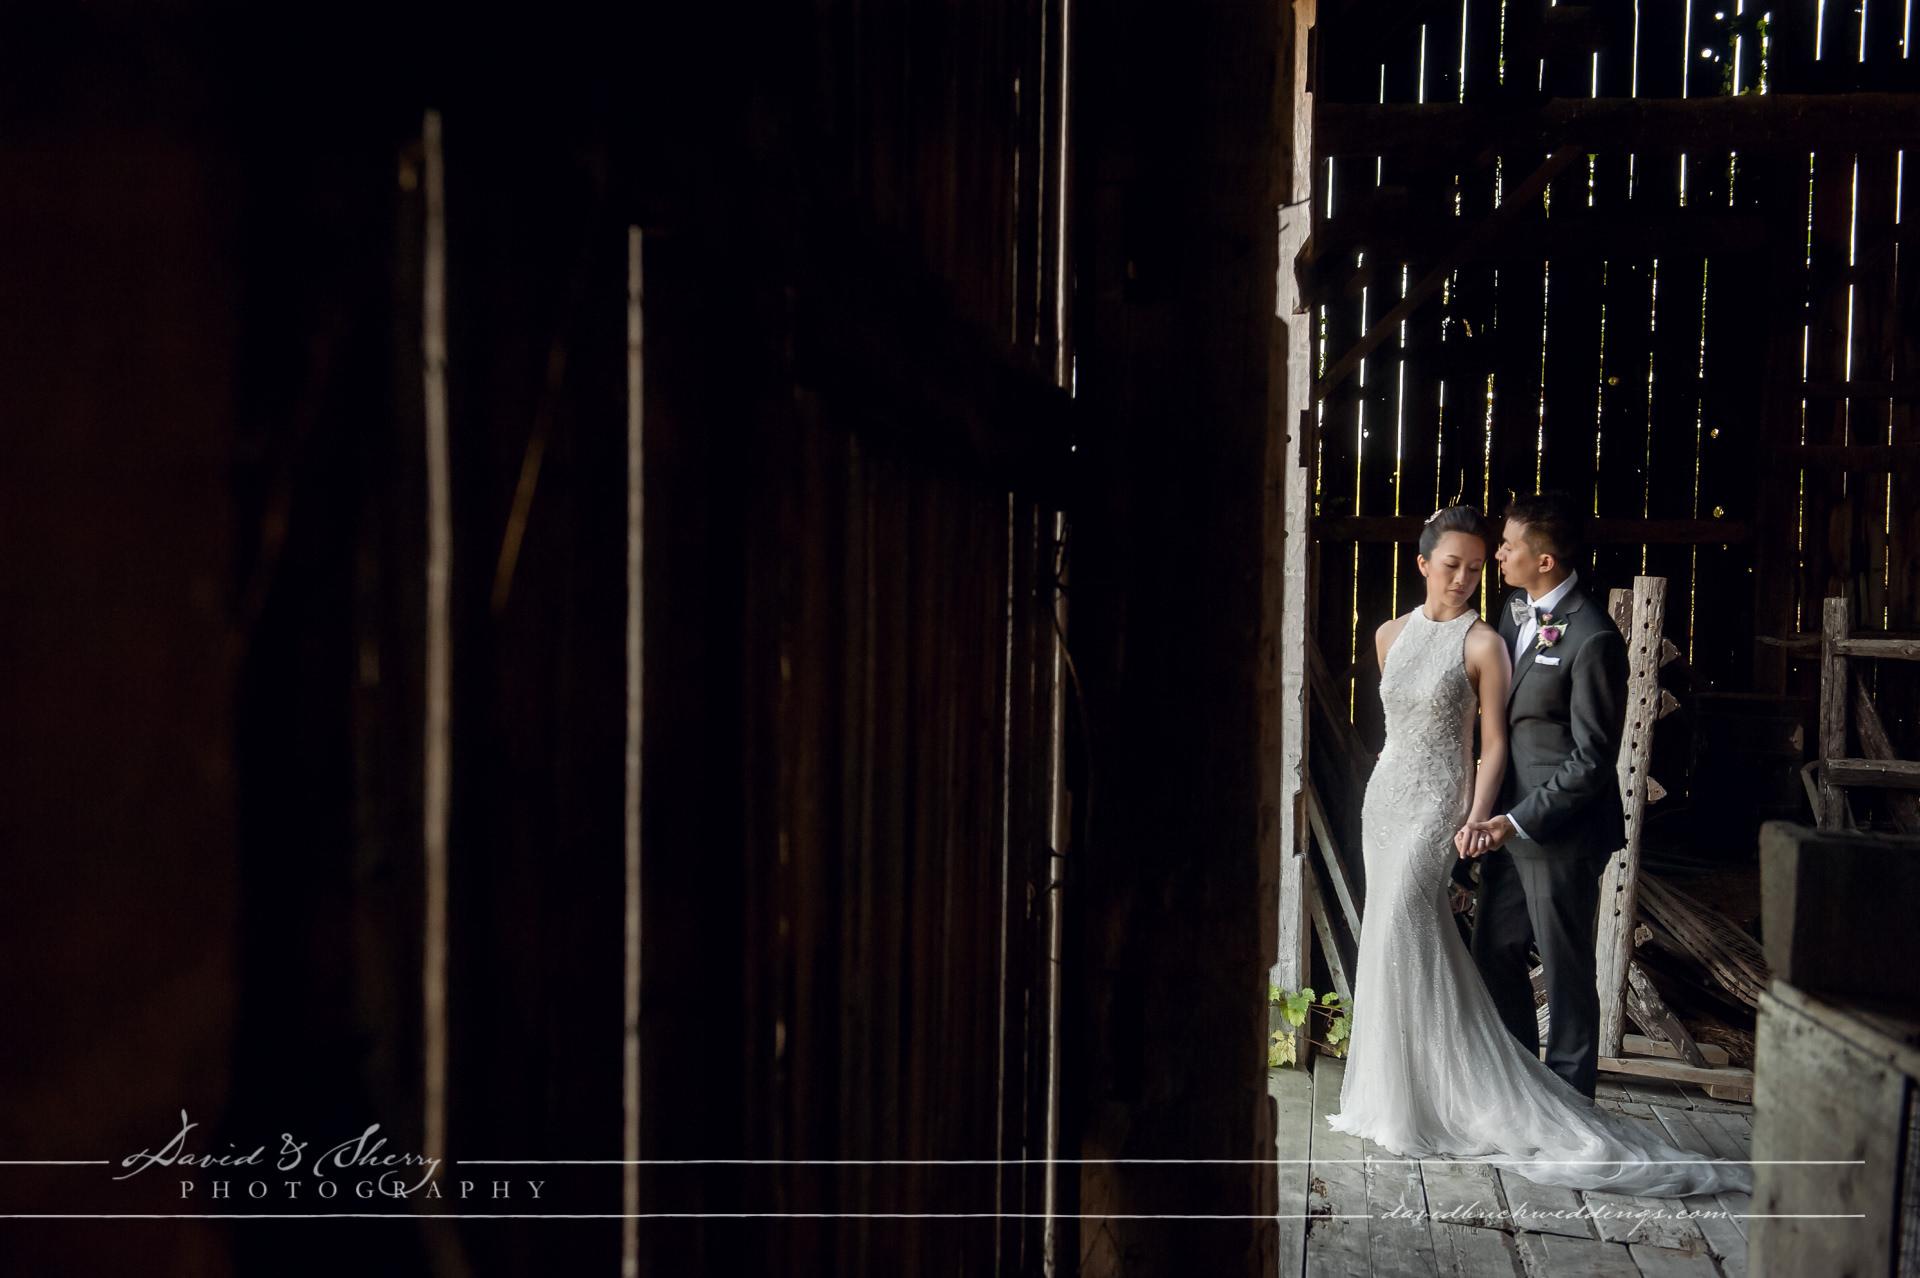 waterstone-estate-wedding-david-sherry-photography-simon-crystal-014